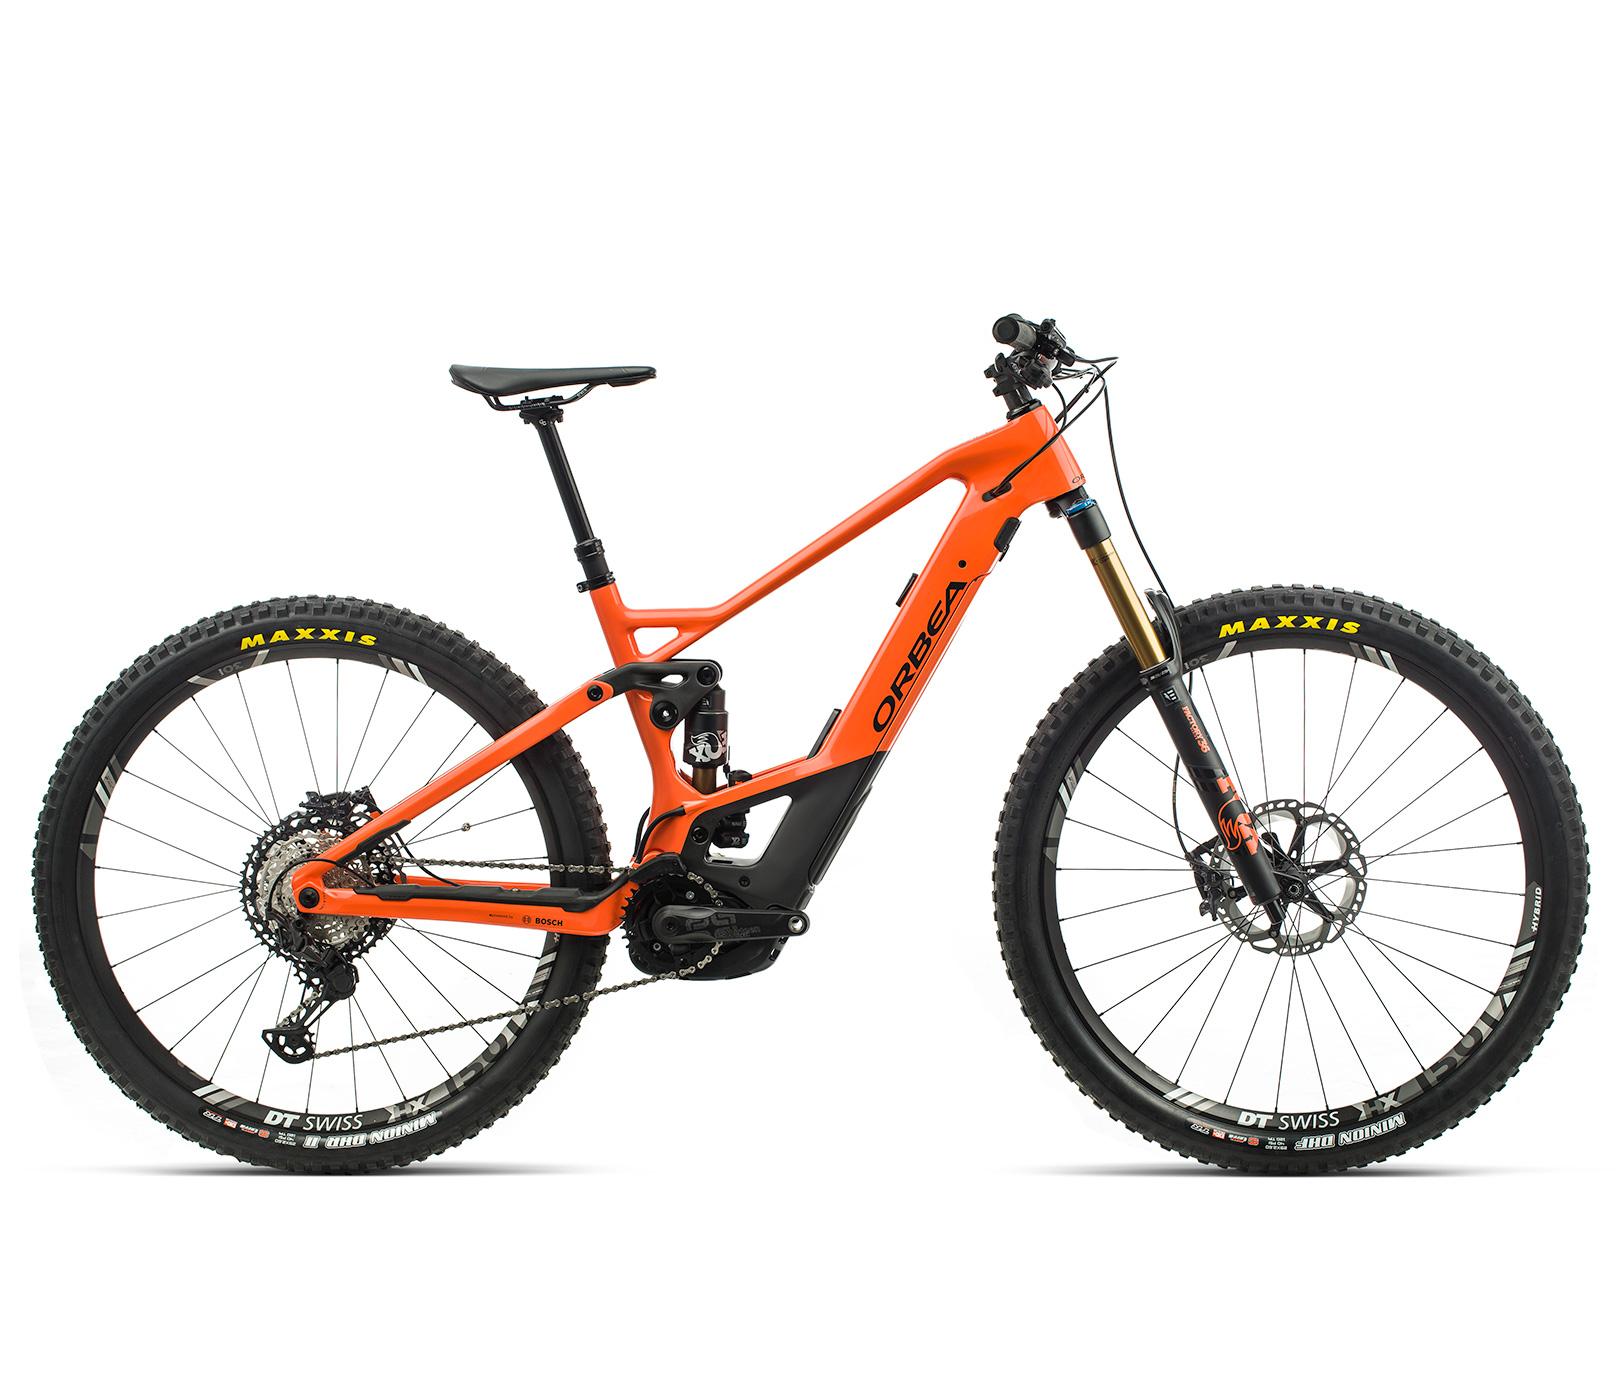 ORBEA WILD FS M-TEAM ebike - ORANJE (GLOSS) / ZWART (DOF) @G-Bikes